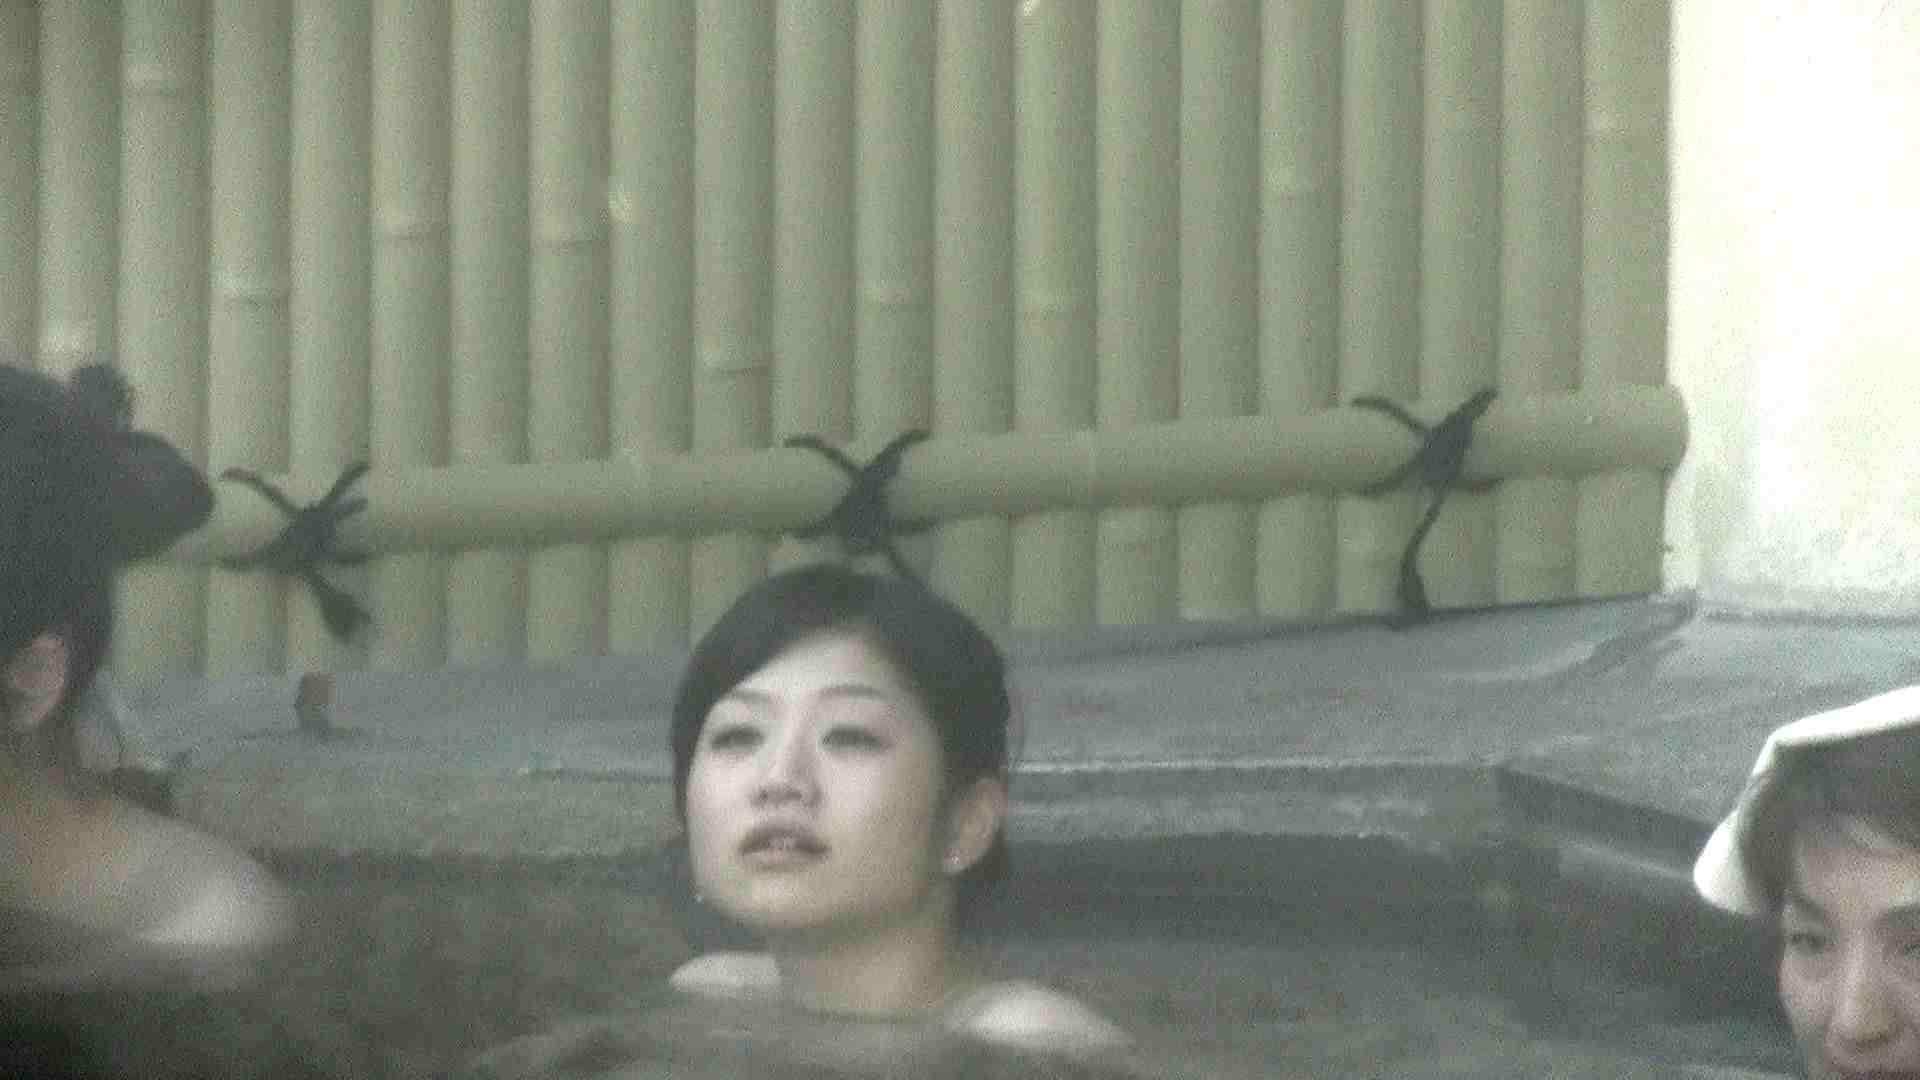 Aquaな露天風呂Vol.206 盗撮シリーズ | 露天風呂編  80PIX 31